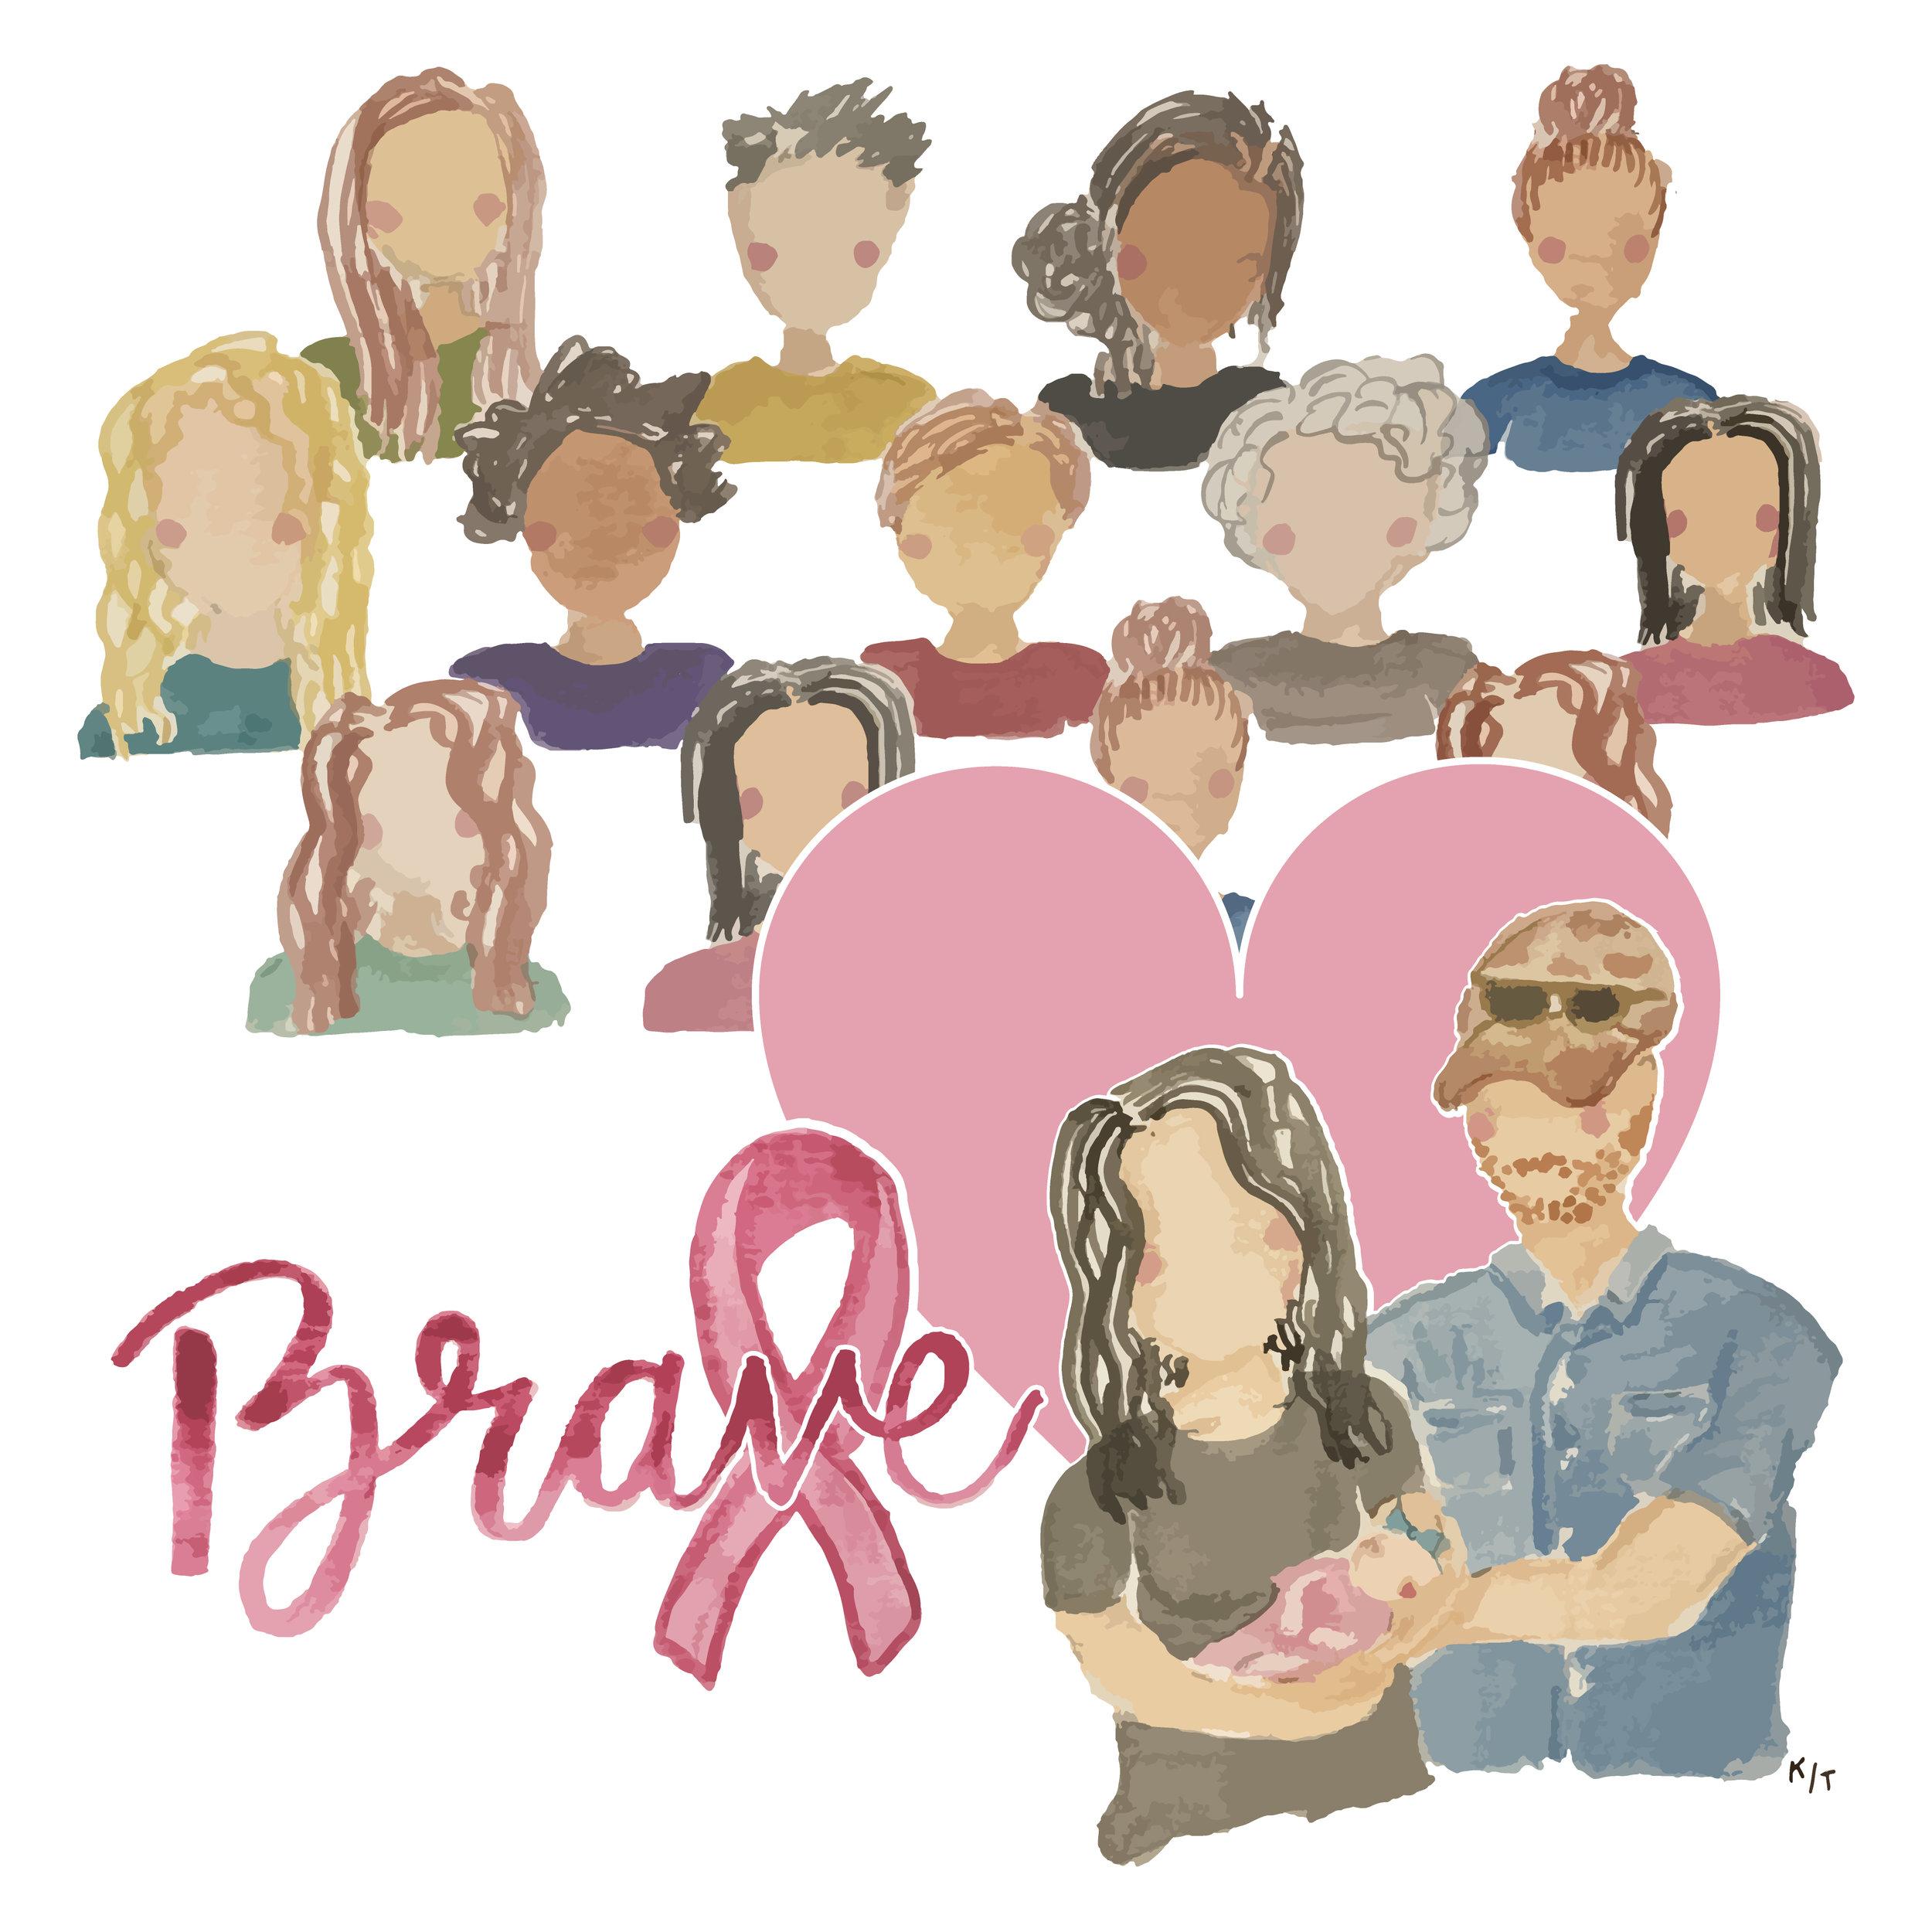 Brooke-Brave.jpg